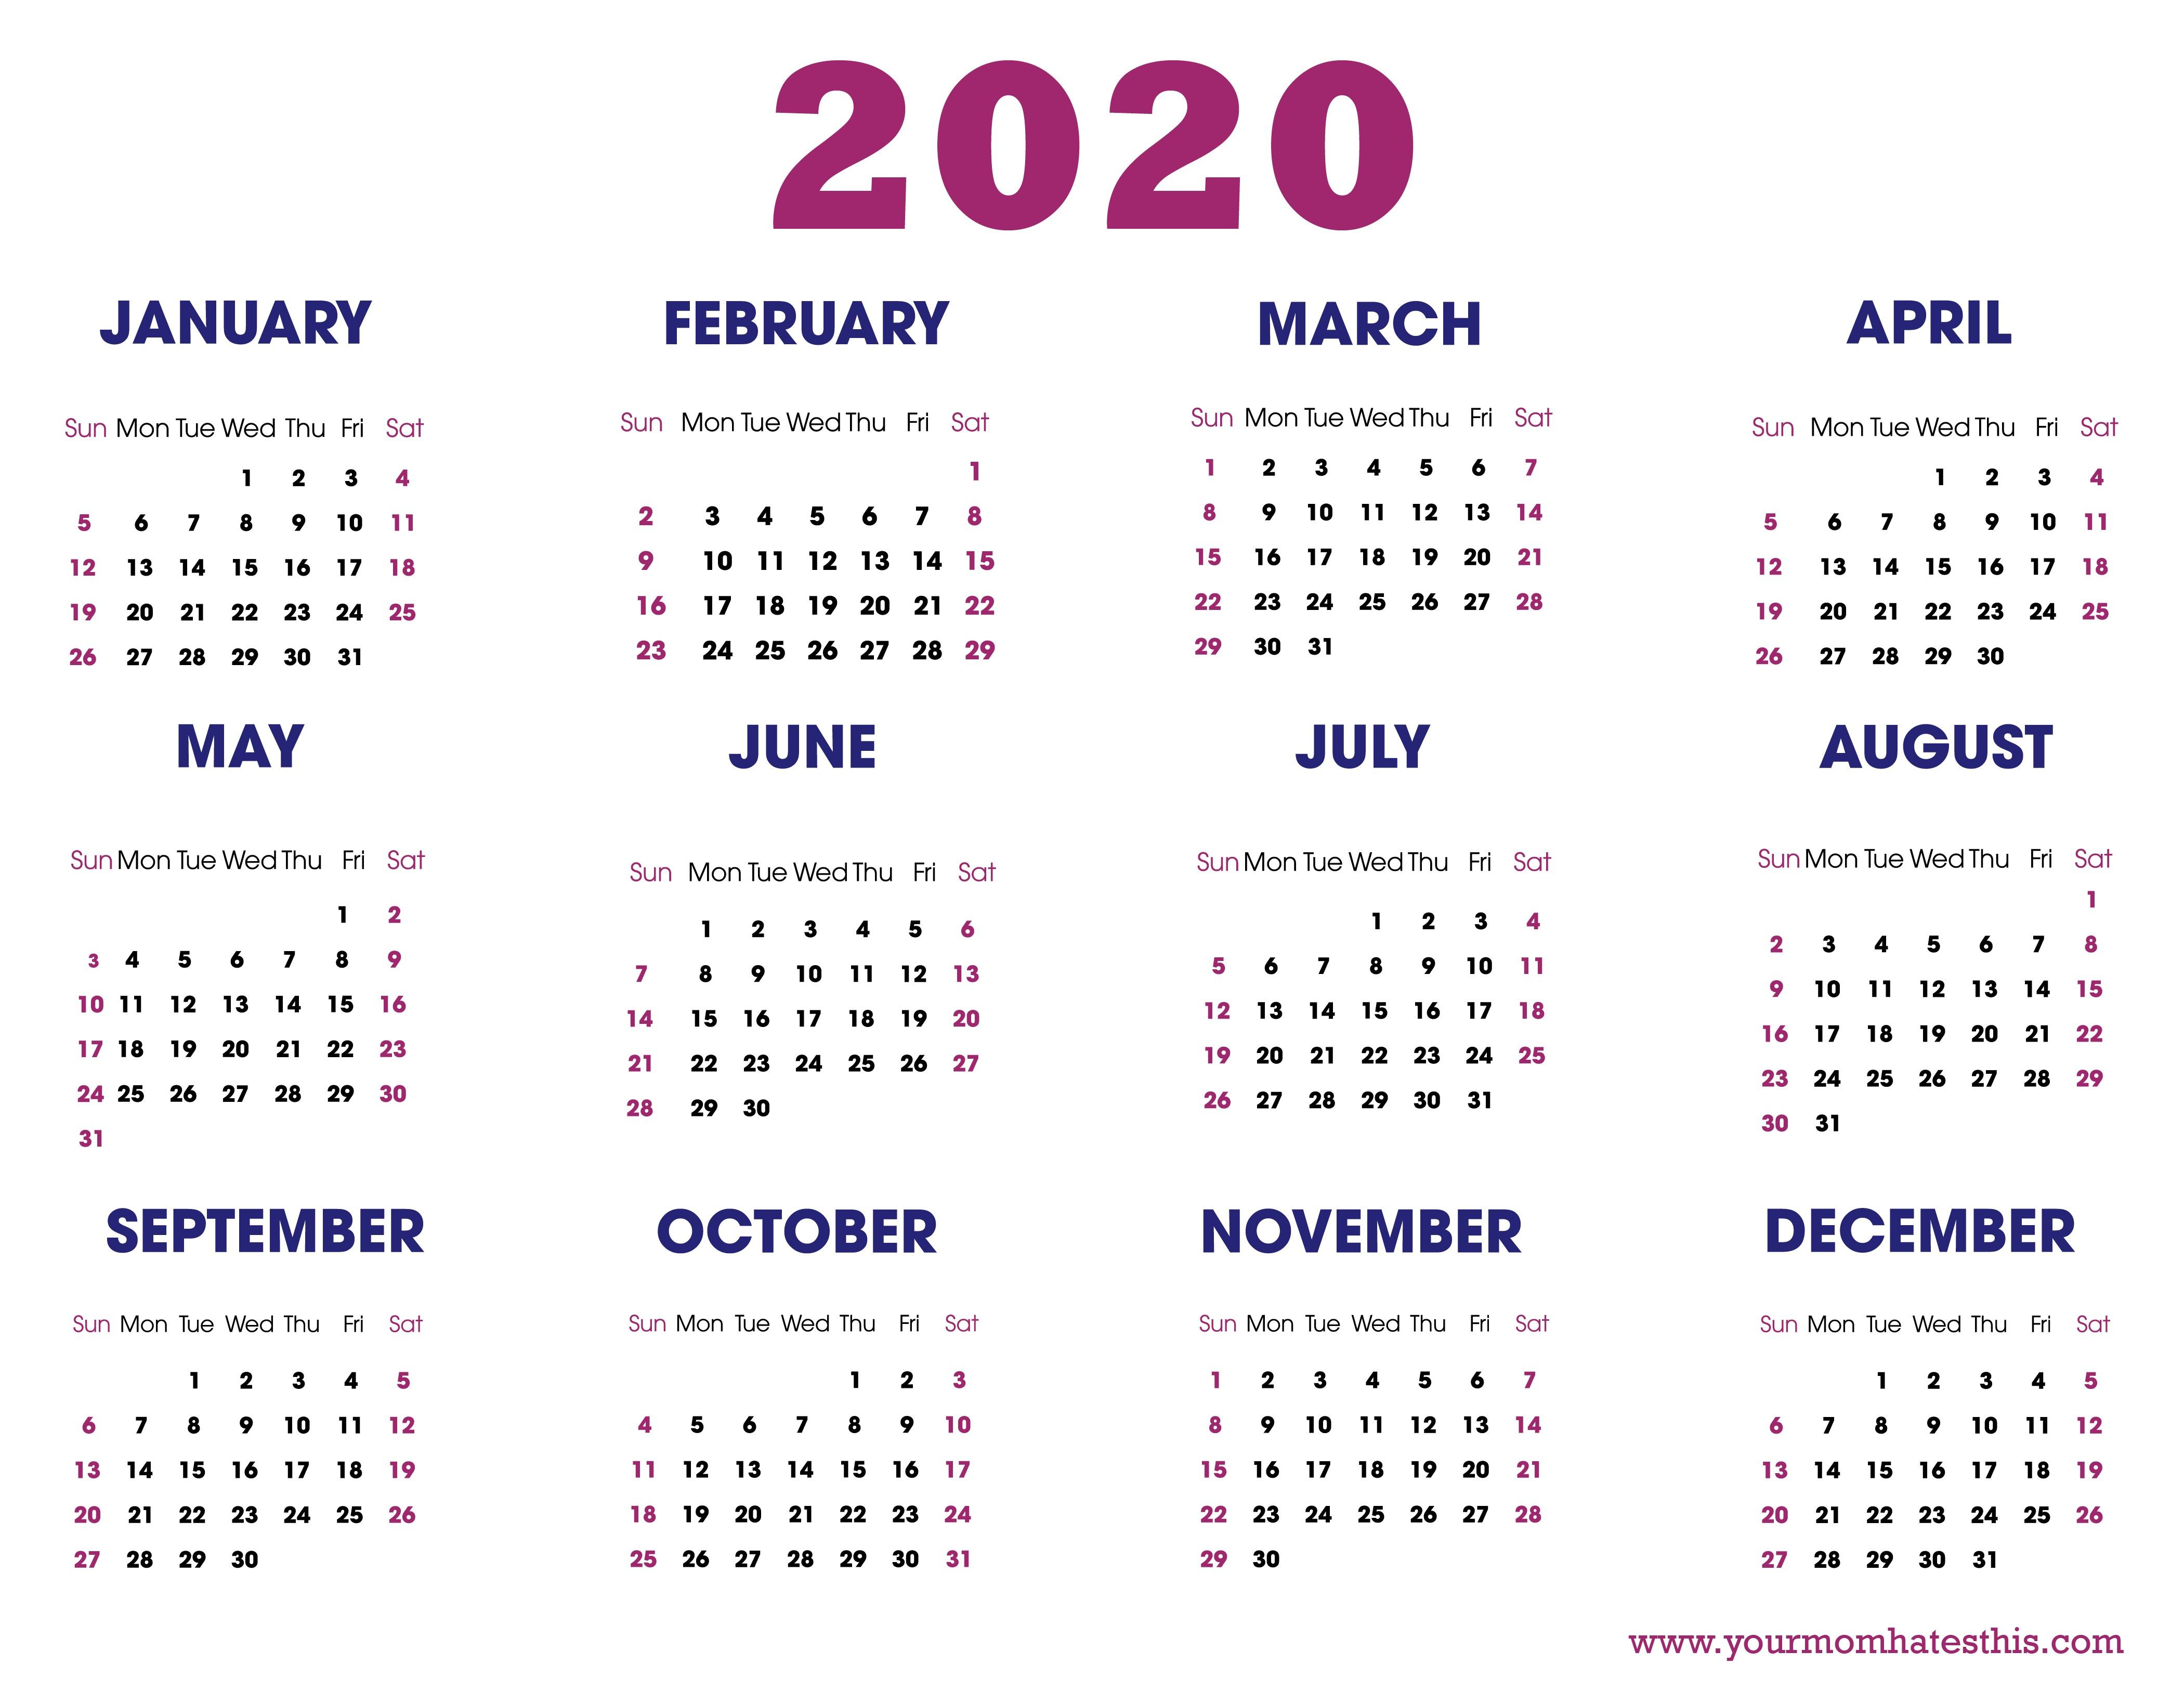 Year Calendar 2020 Printable 2020 Calendars In Pdf Download Templates Of Calendar 2020